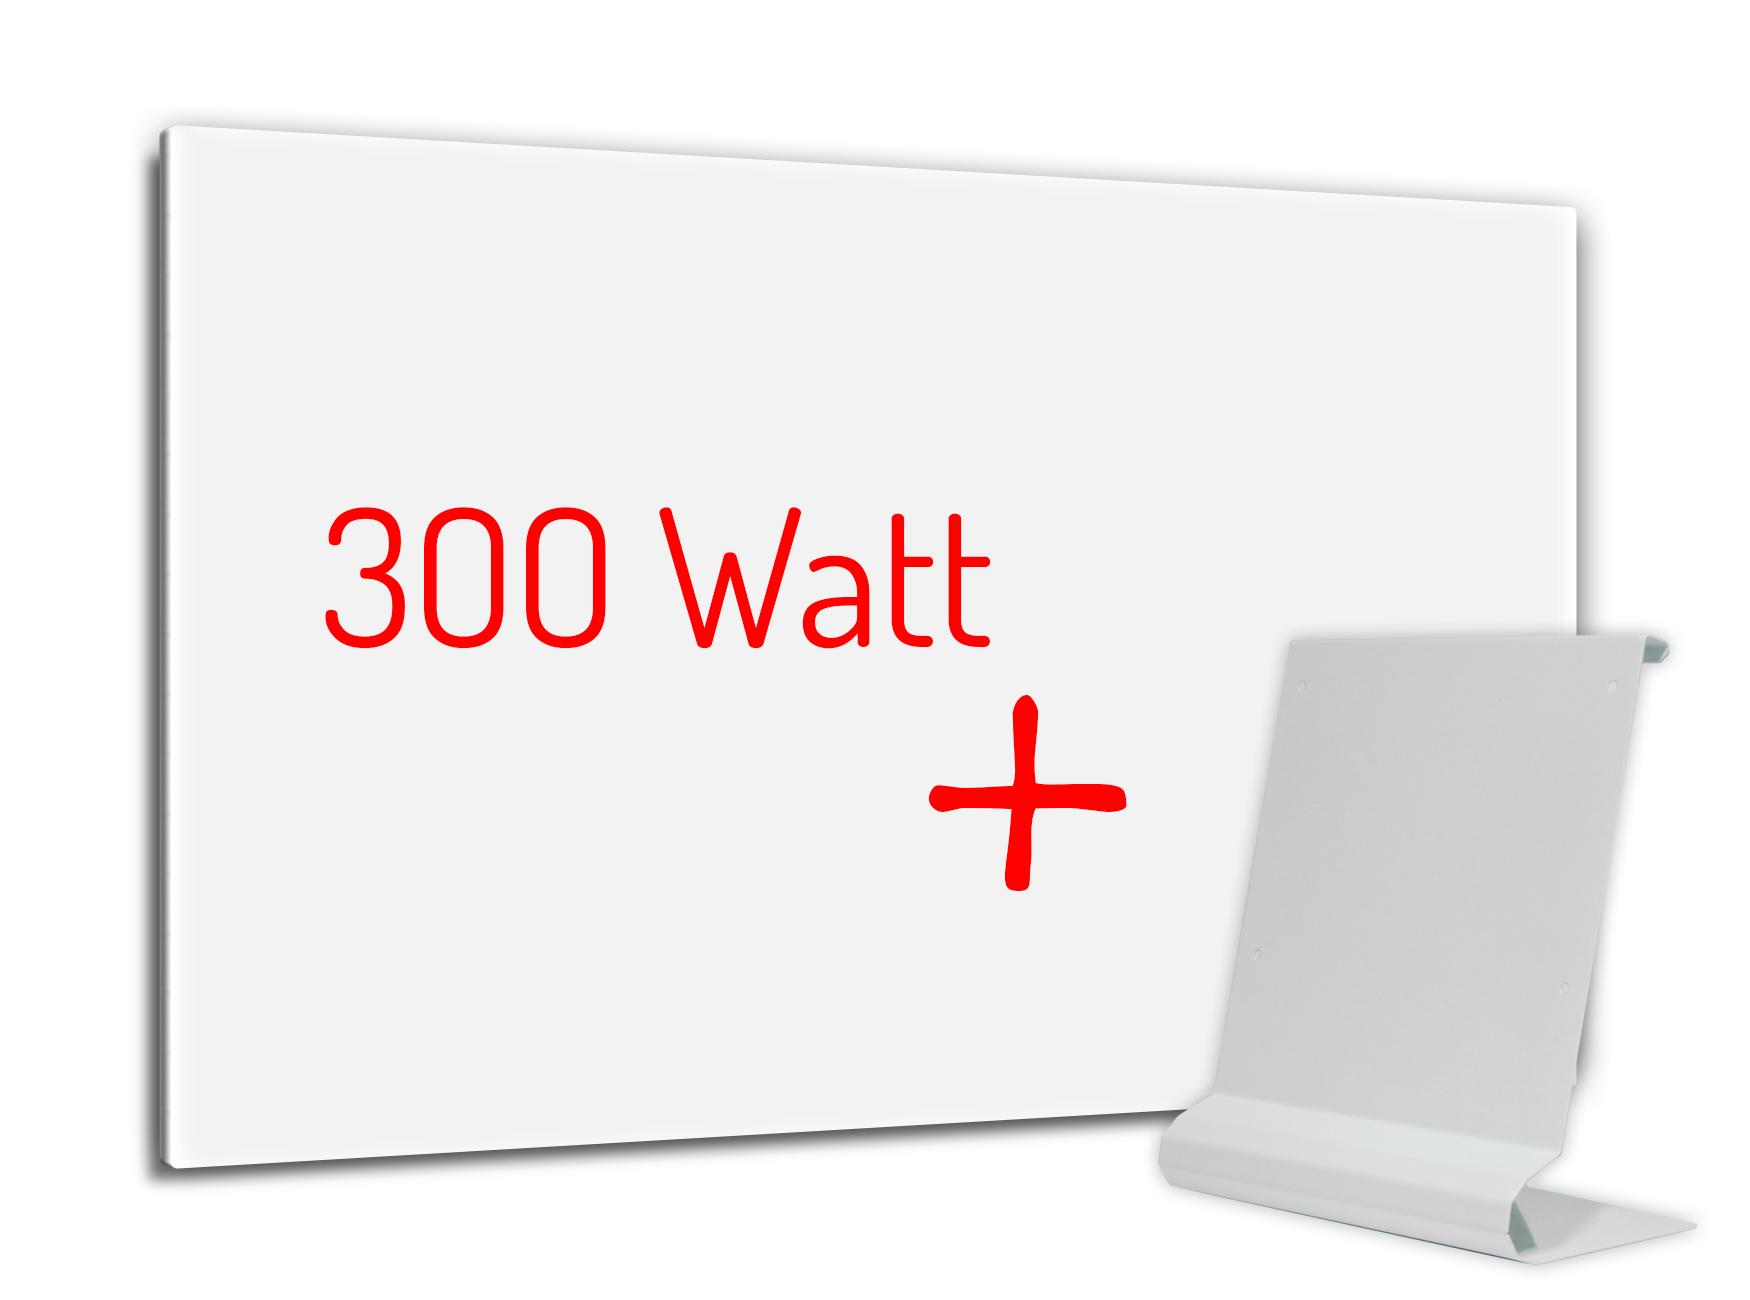 PowerSun Standheizung 300 Watt 40x60cm